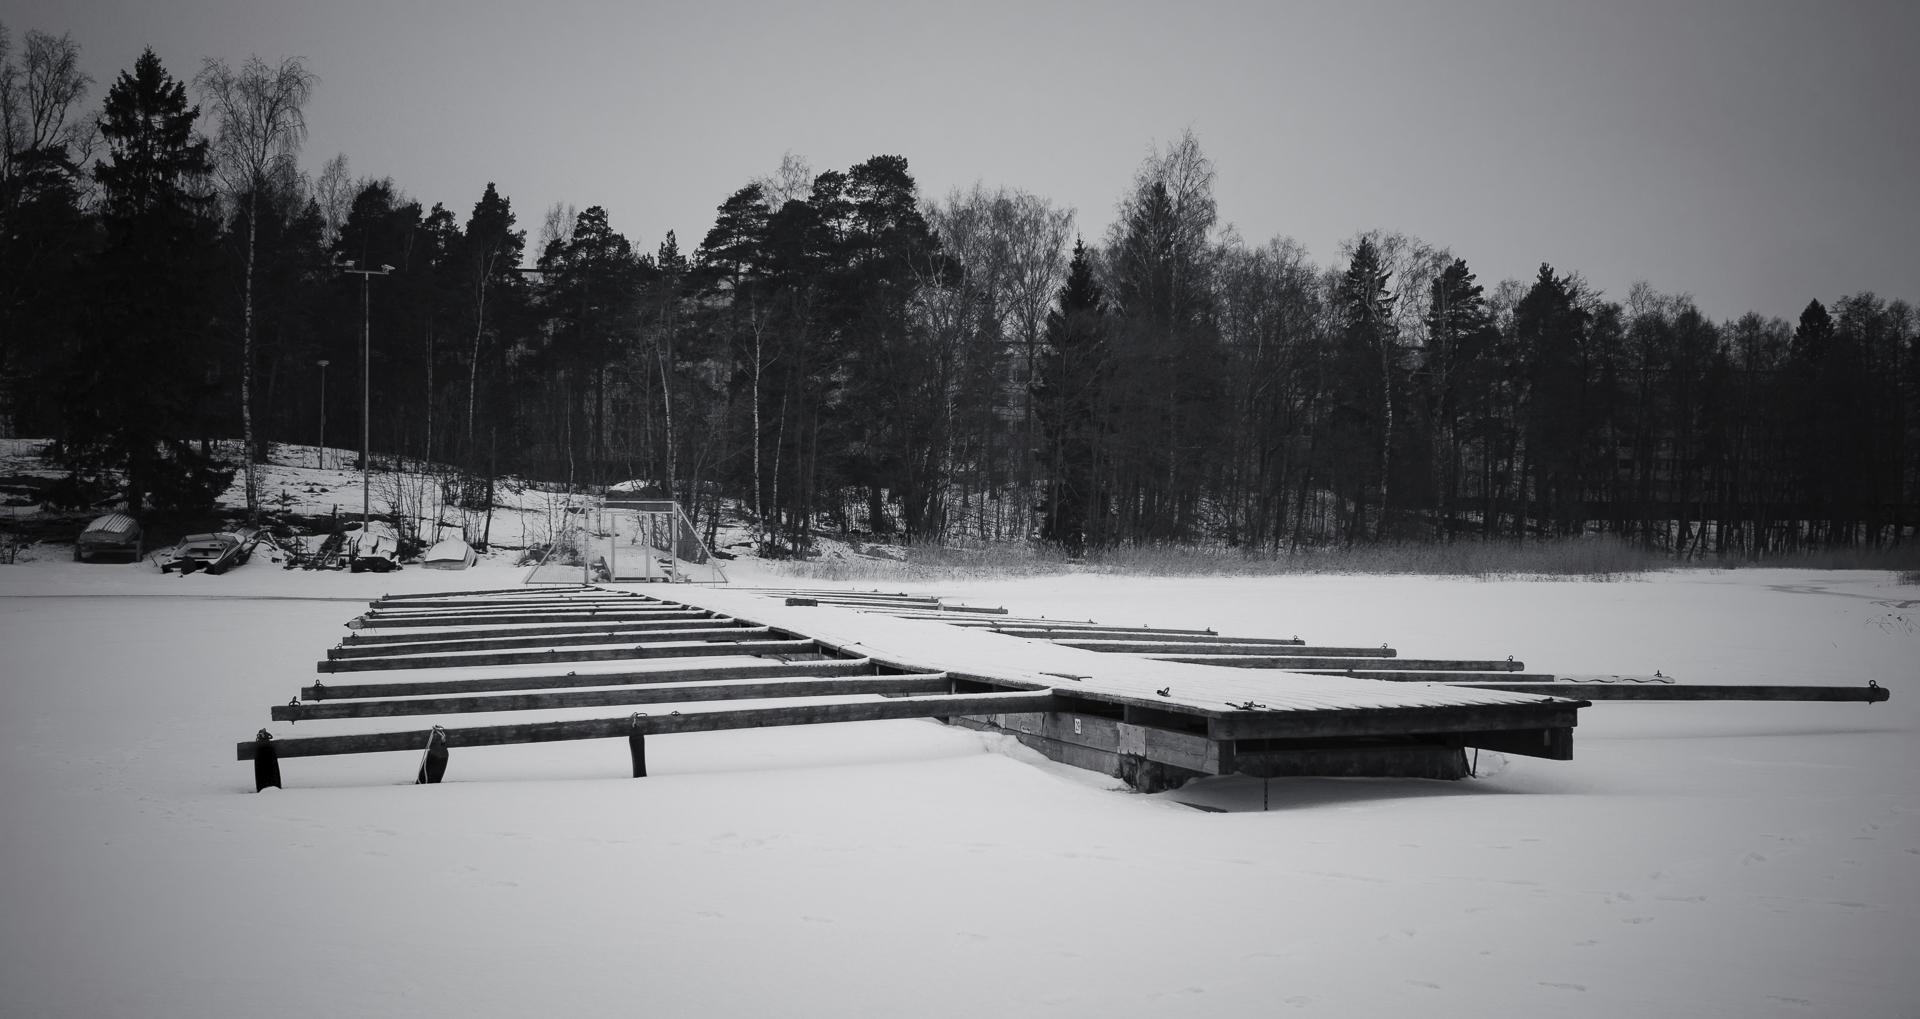 Otsolahti marina - photography, landscape - anttitassberg | ello